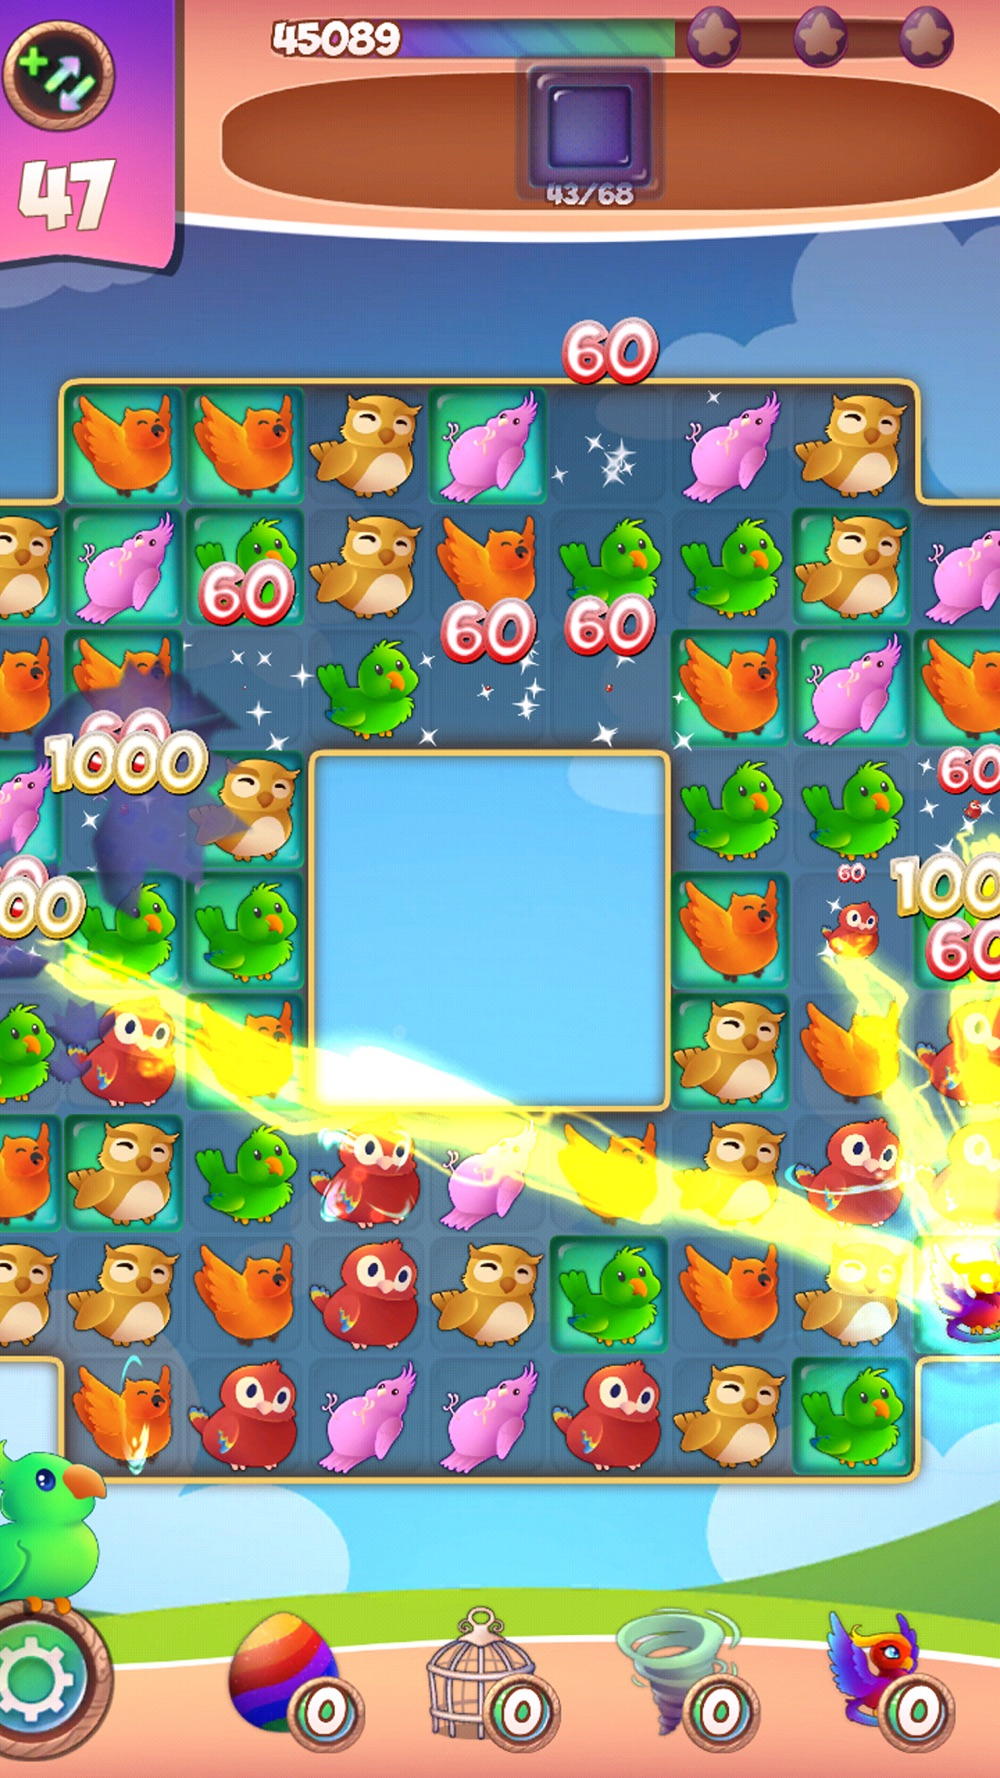 Birds: Free Match 3 Games Cheat Codes